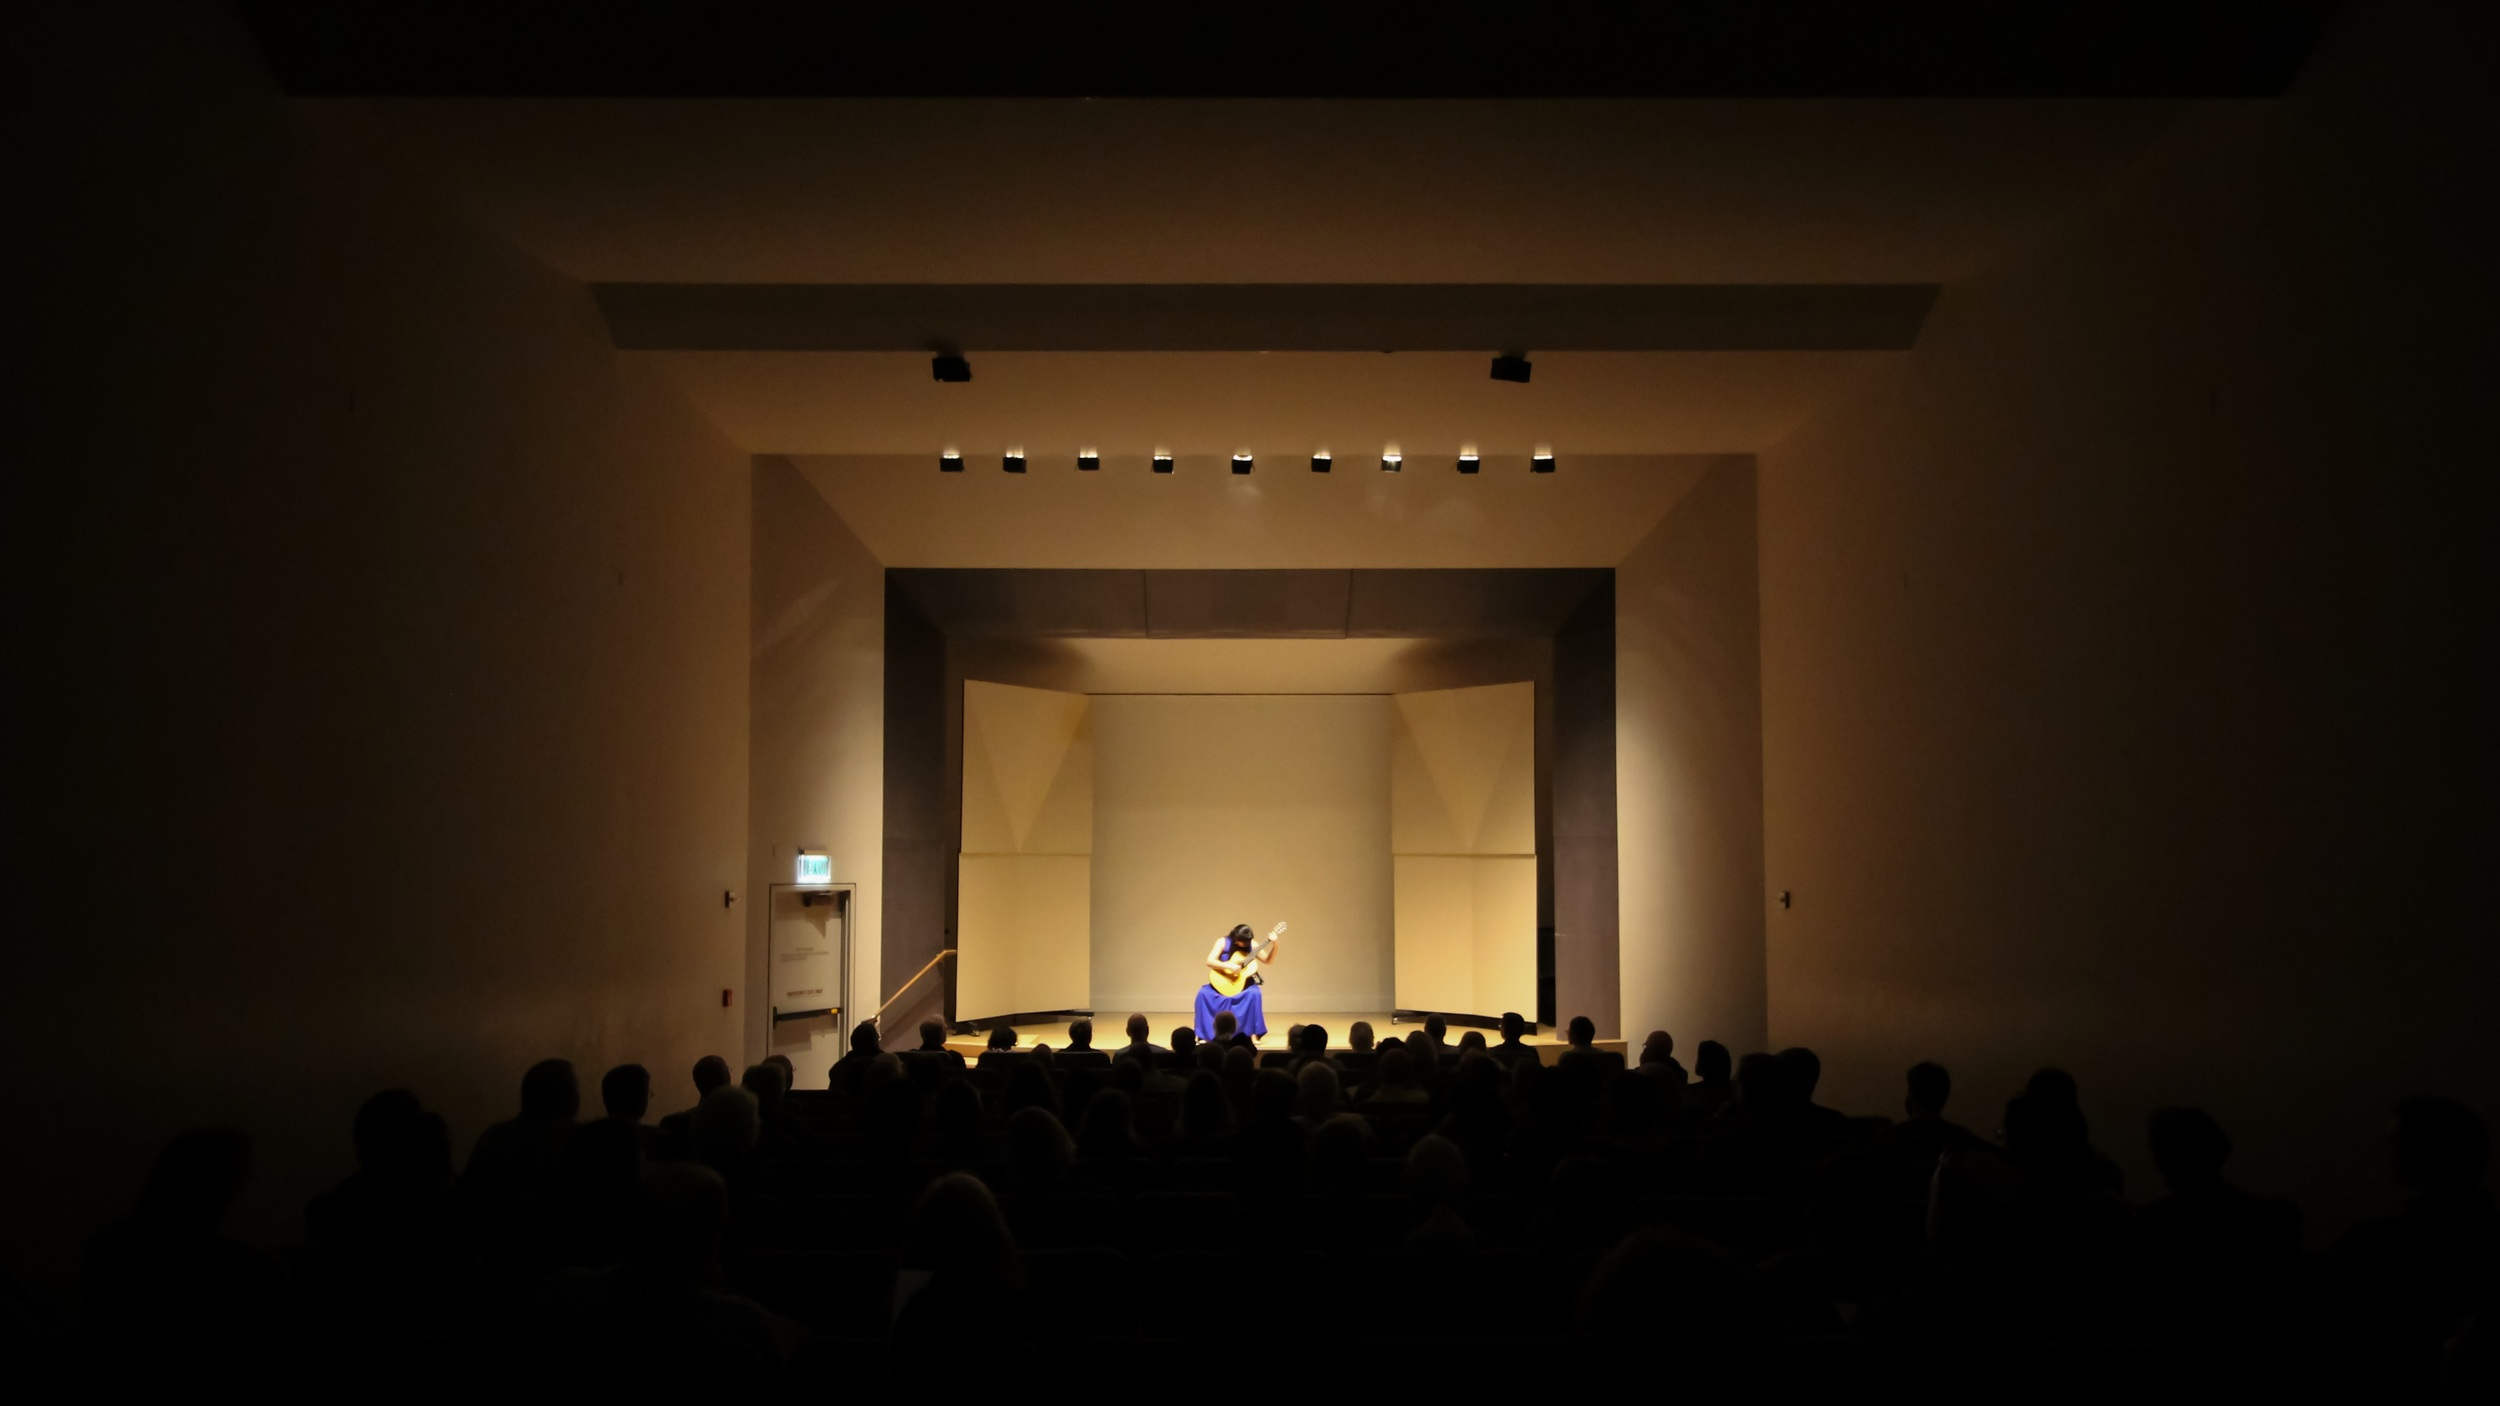 seattle concert.jpg